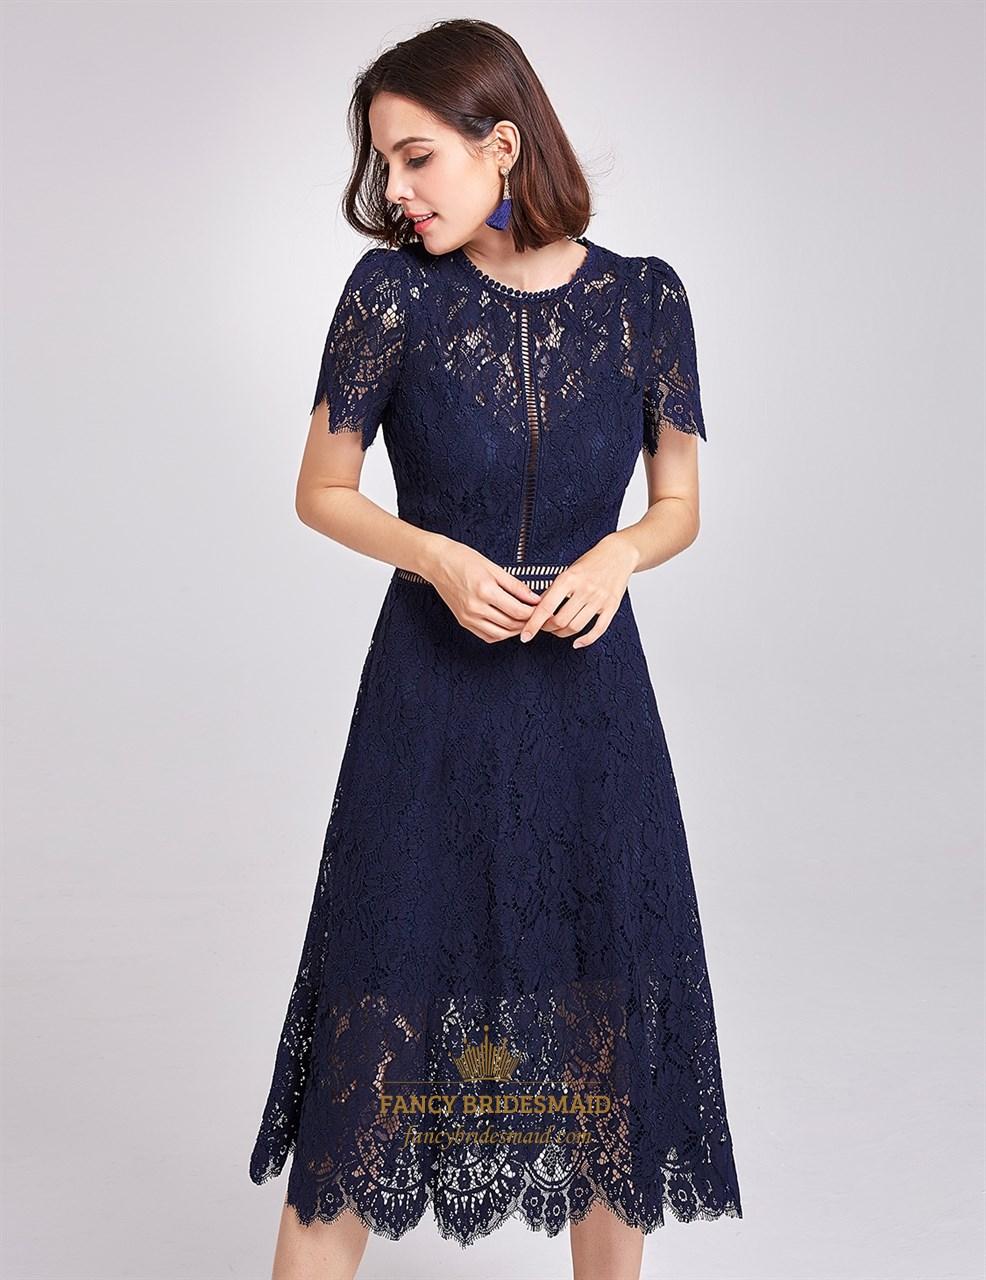 ddadd3ce279d Short Sleeve Navy Blue Cocktail Dress - raveitsafe